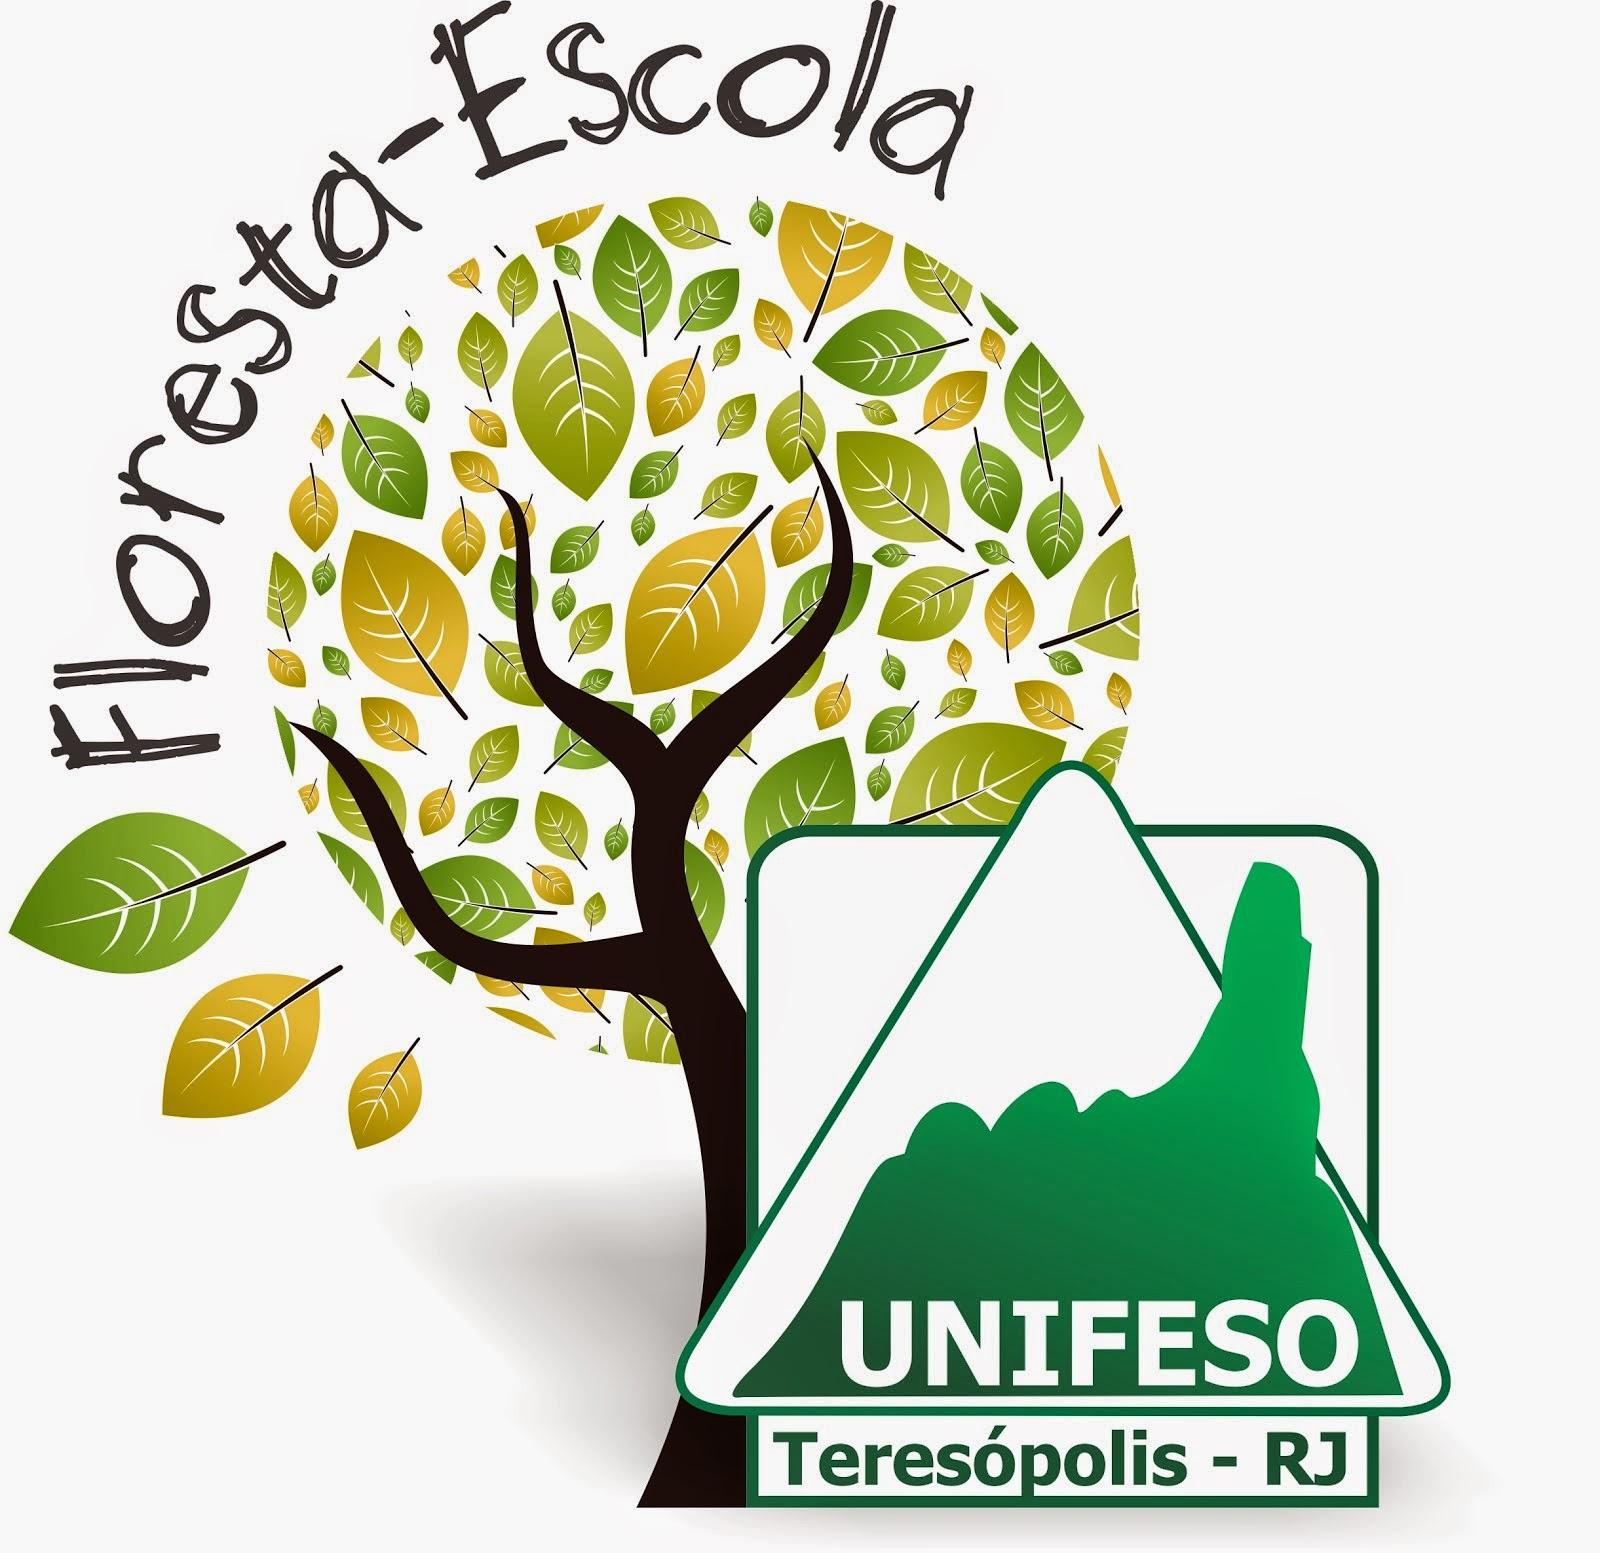 FLORESTA-ESCOLA DO UNIFESO